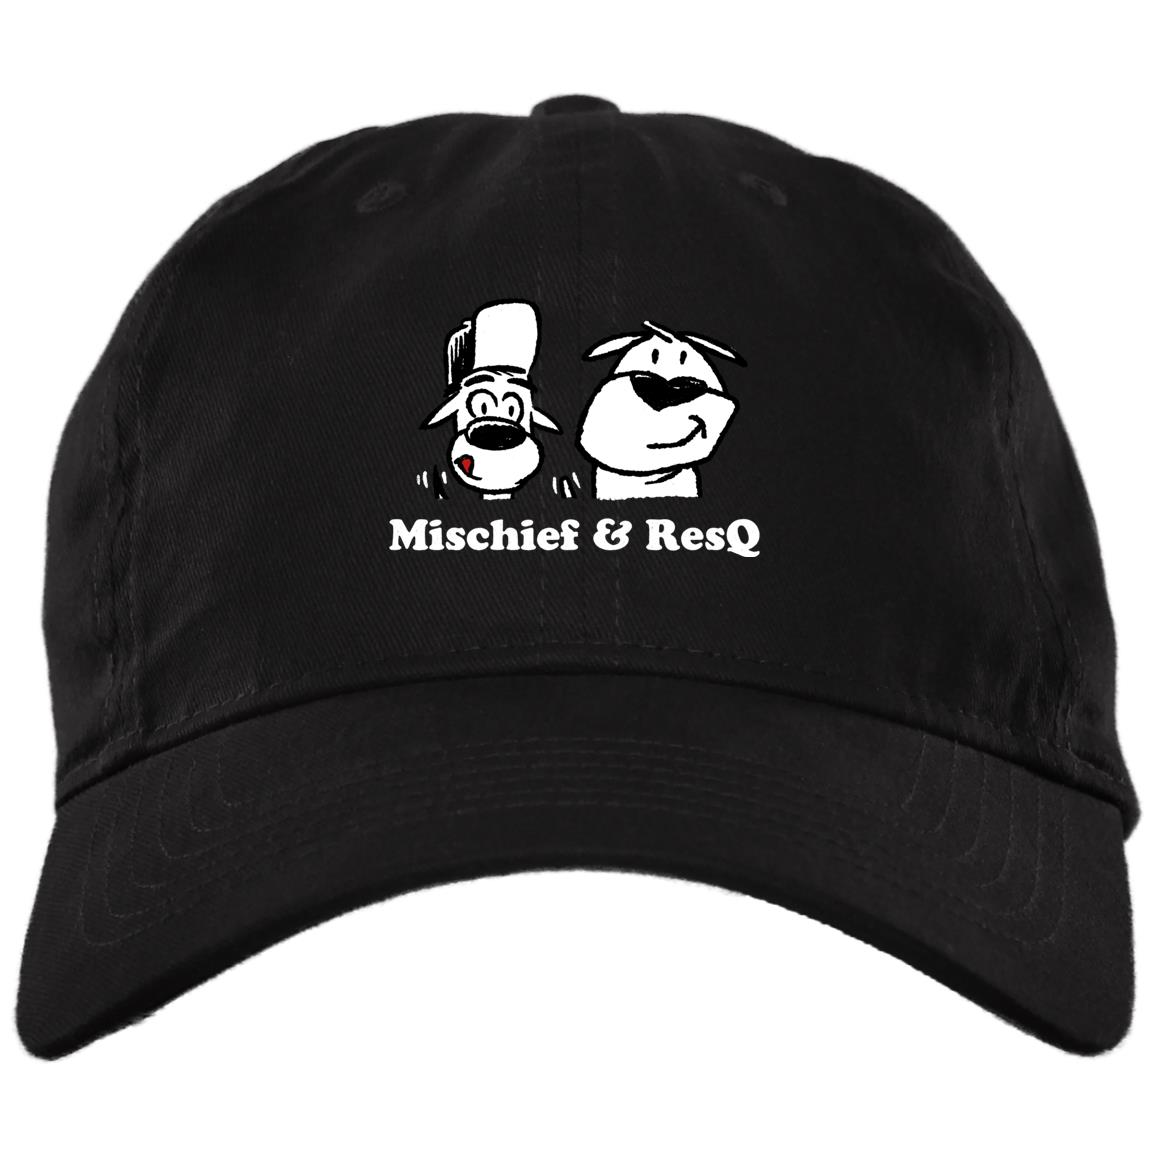 Mischief & ResQ- Cap 🐾  Deal 24% Off!